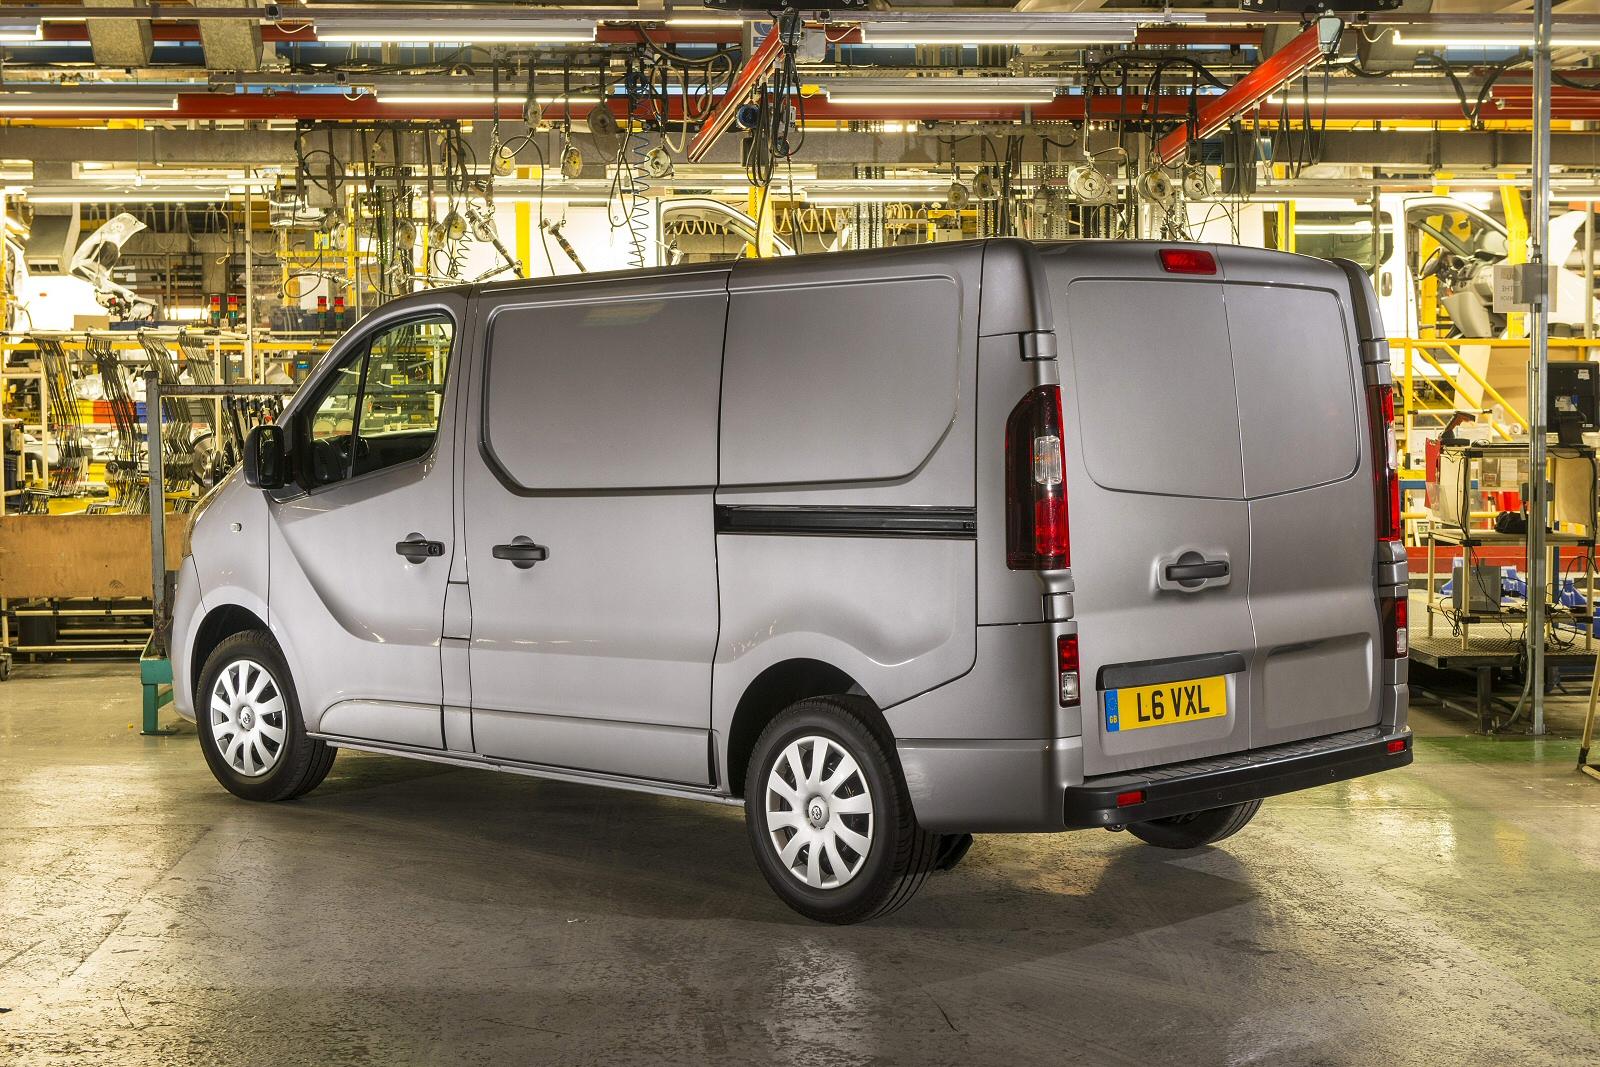 New Vauxhall Vivaro L1 Special Editions 2700 16cdti Biturbo 125 Where Is The Inertia Switch On 2015 Nissan Ecotec H1 Ltd Ed Nav Van For Sale Bristol Street